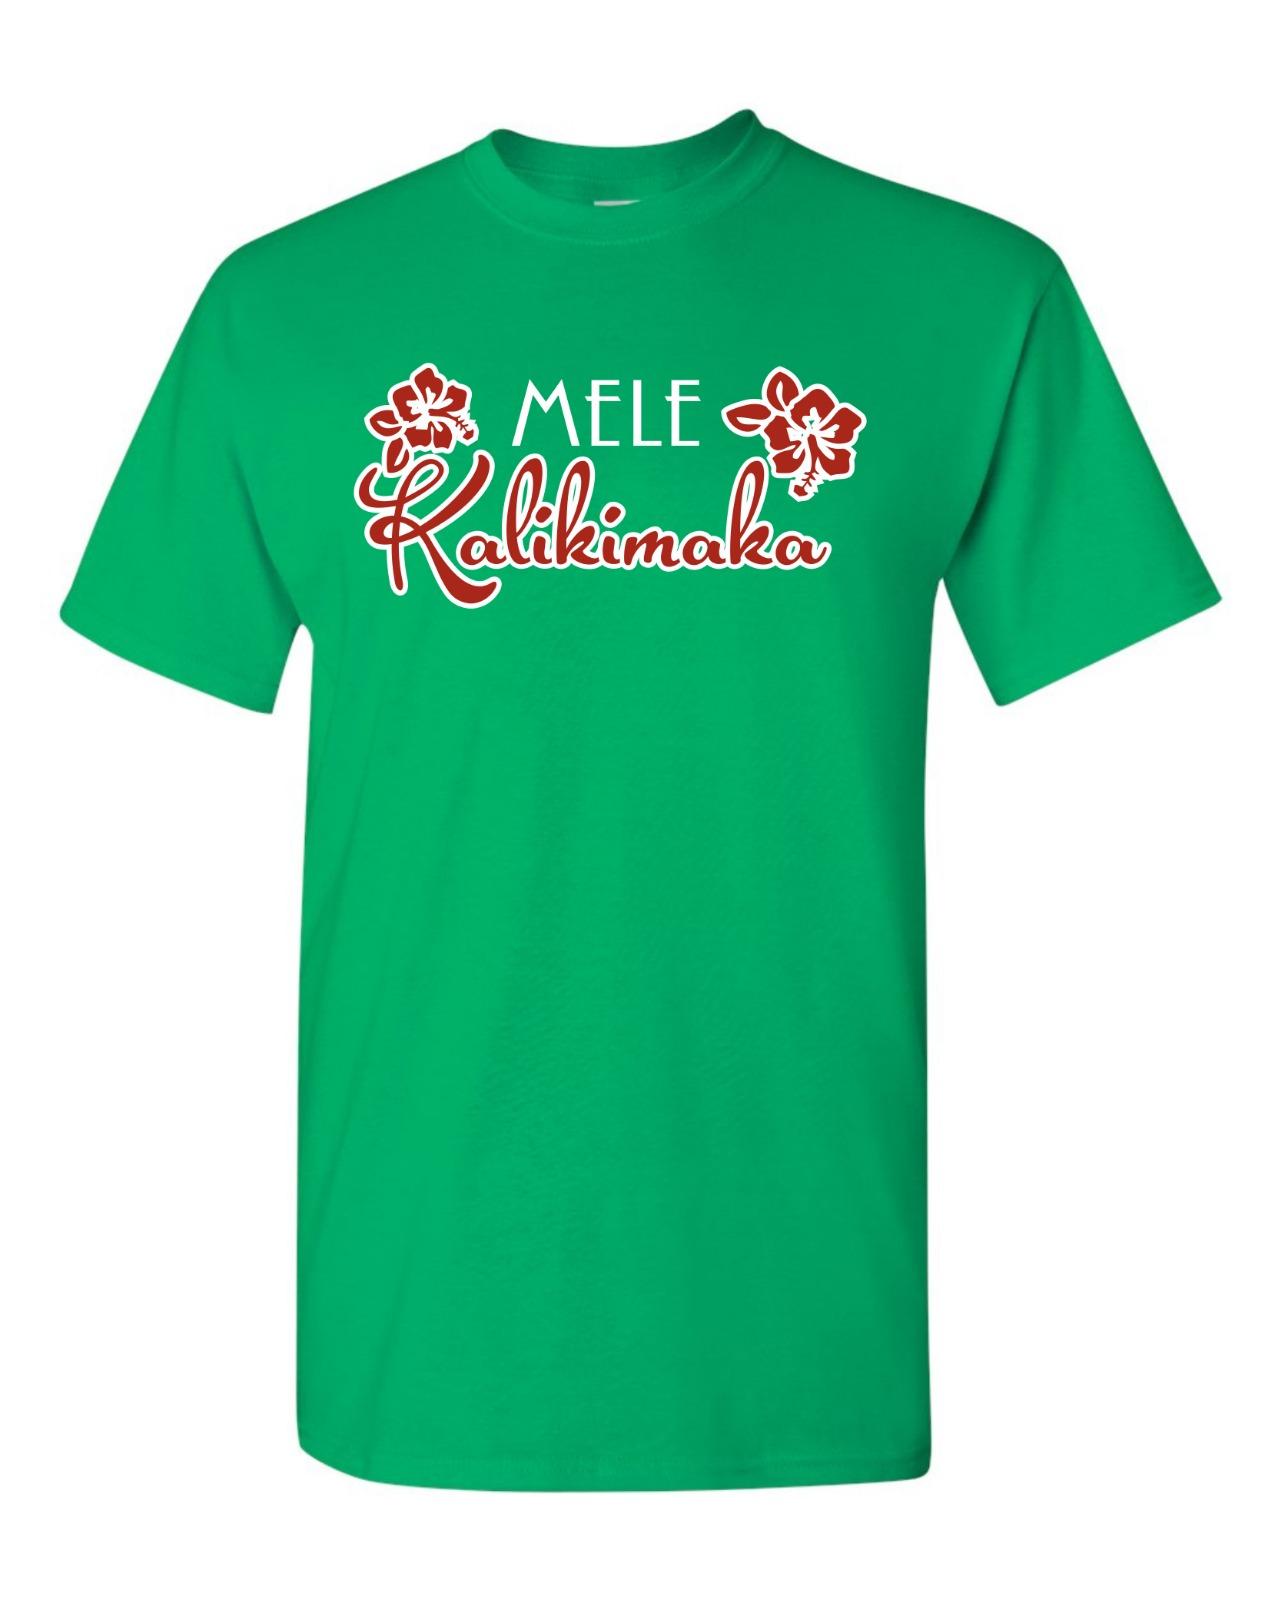 Mele Kalikimaka  Funny Hawaii Christmas Griswold Green Basic Men/'s T-Shirt